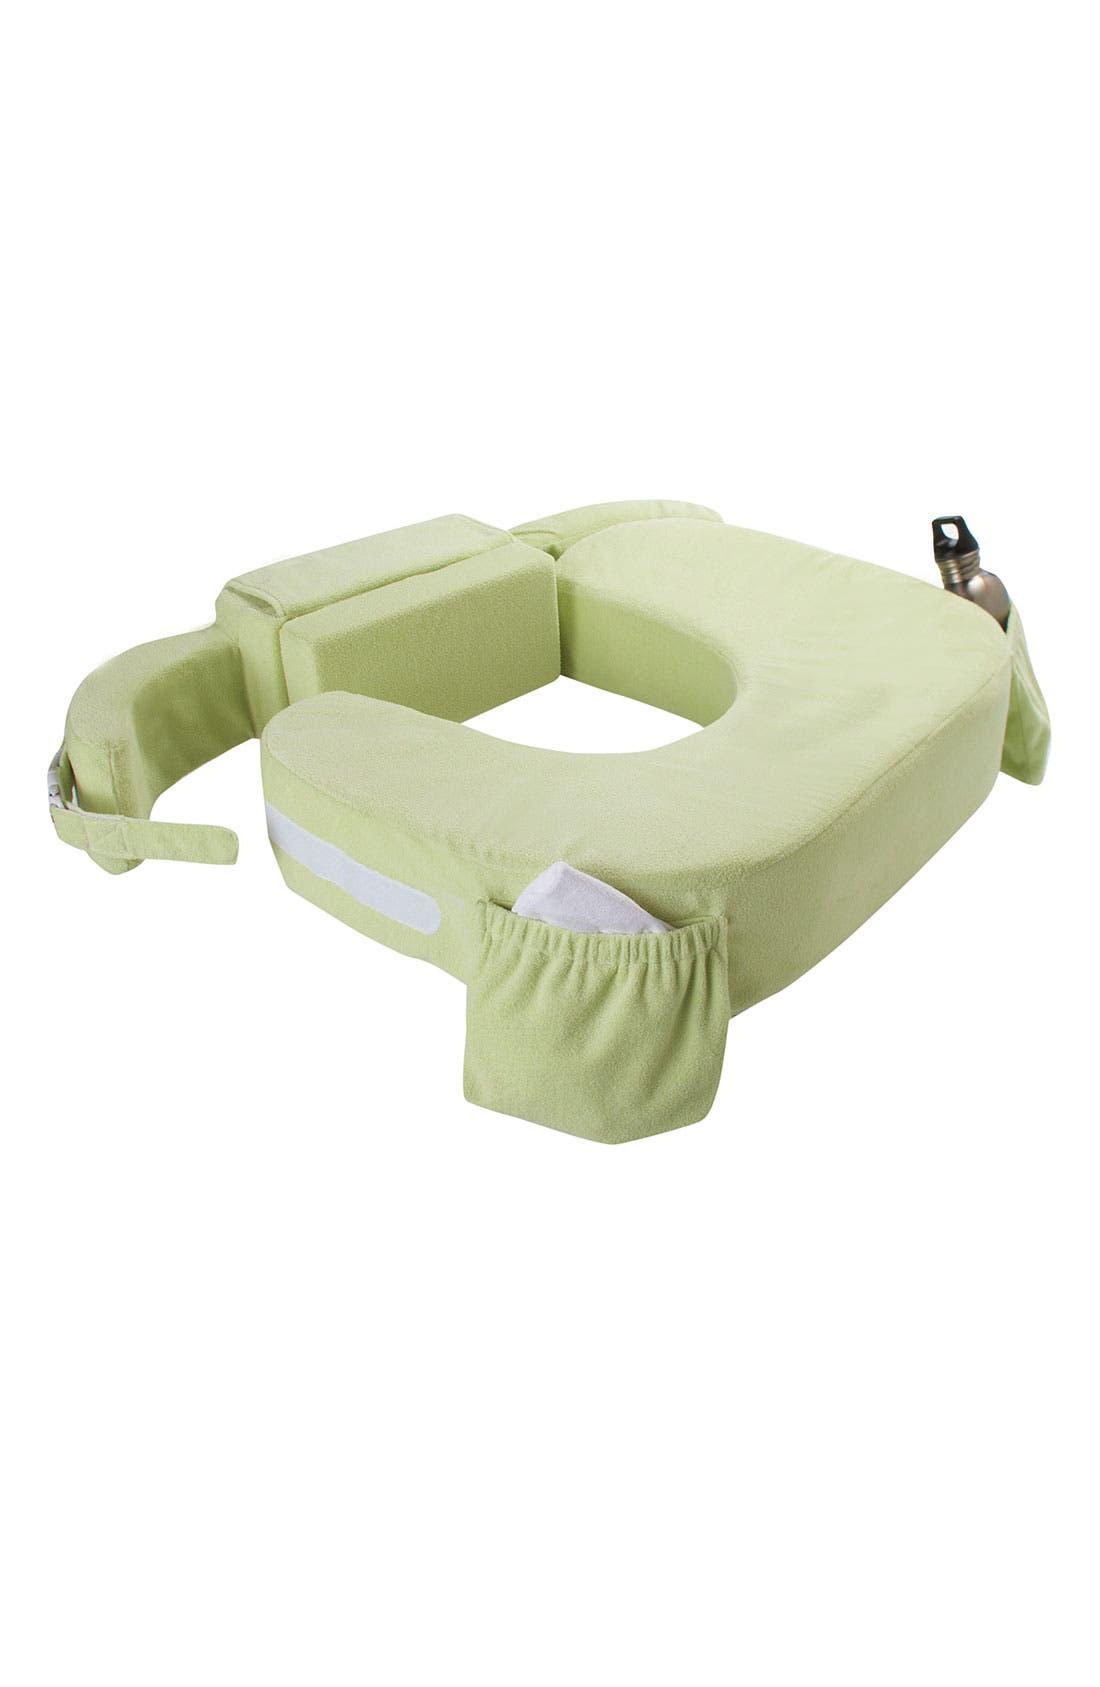 Main Image - My Brest Friend Twins Nursing Pillow